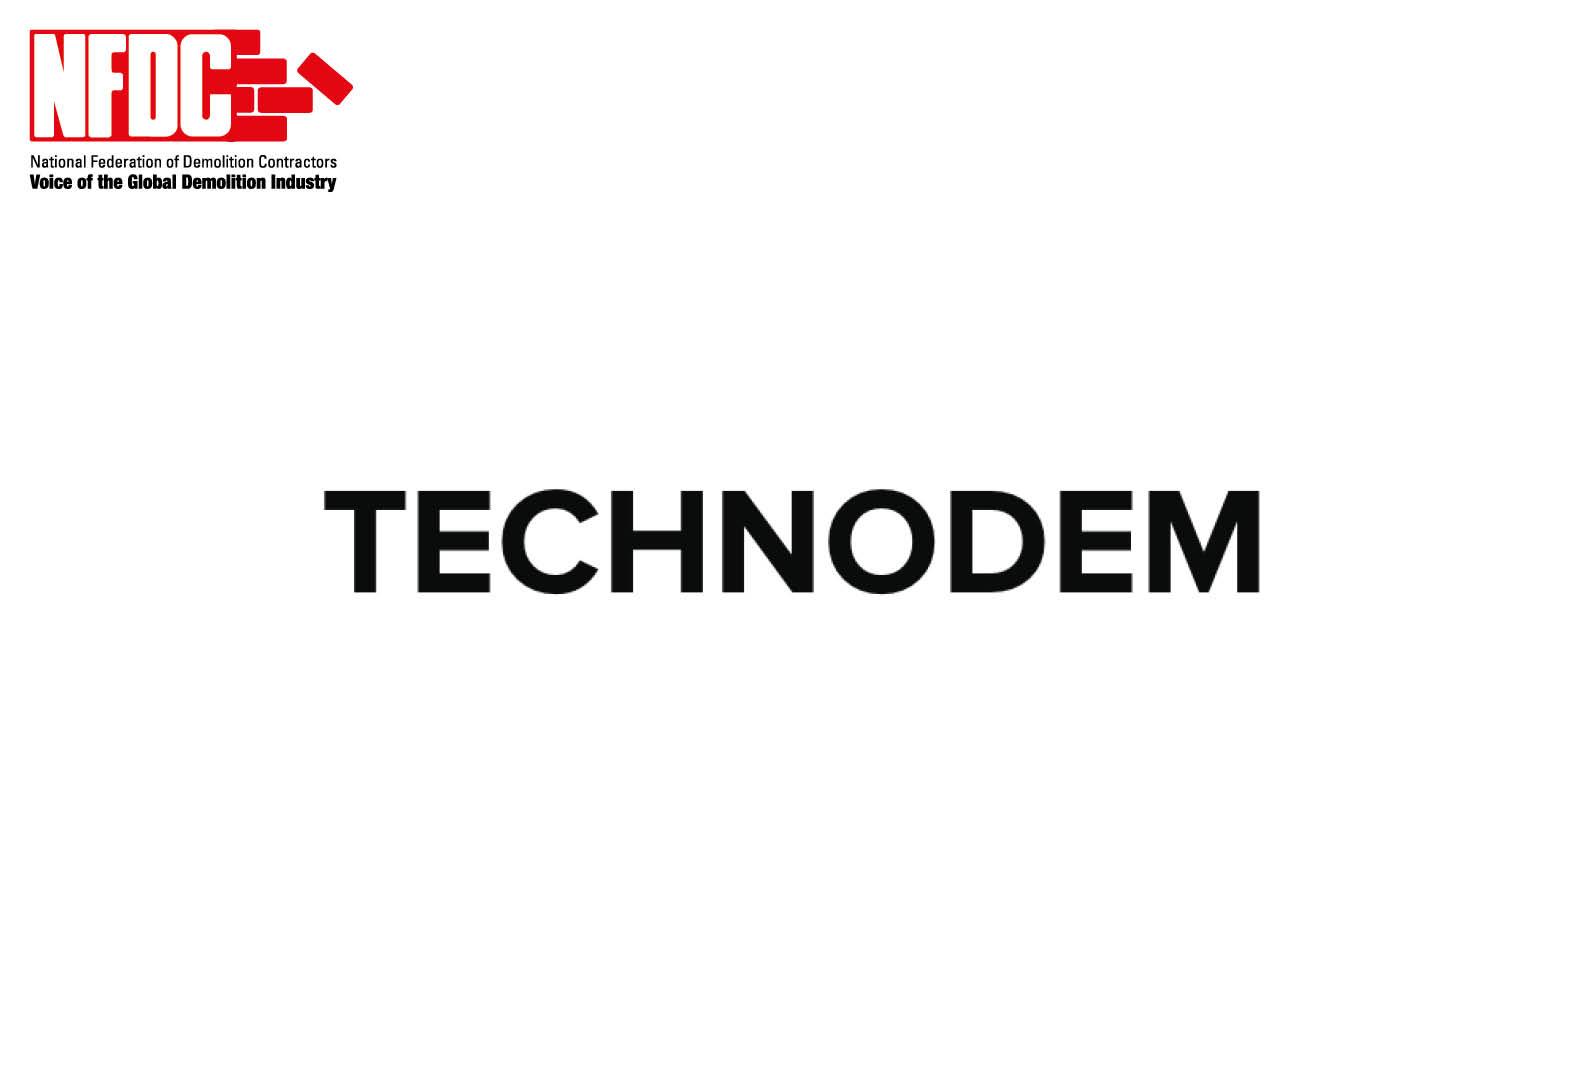 Technodem